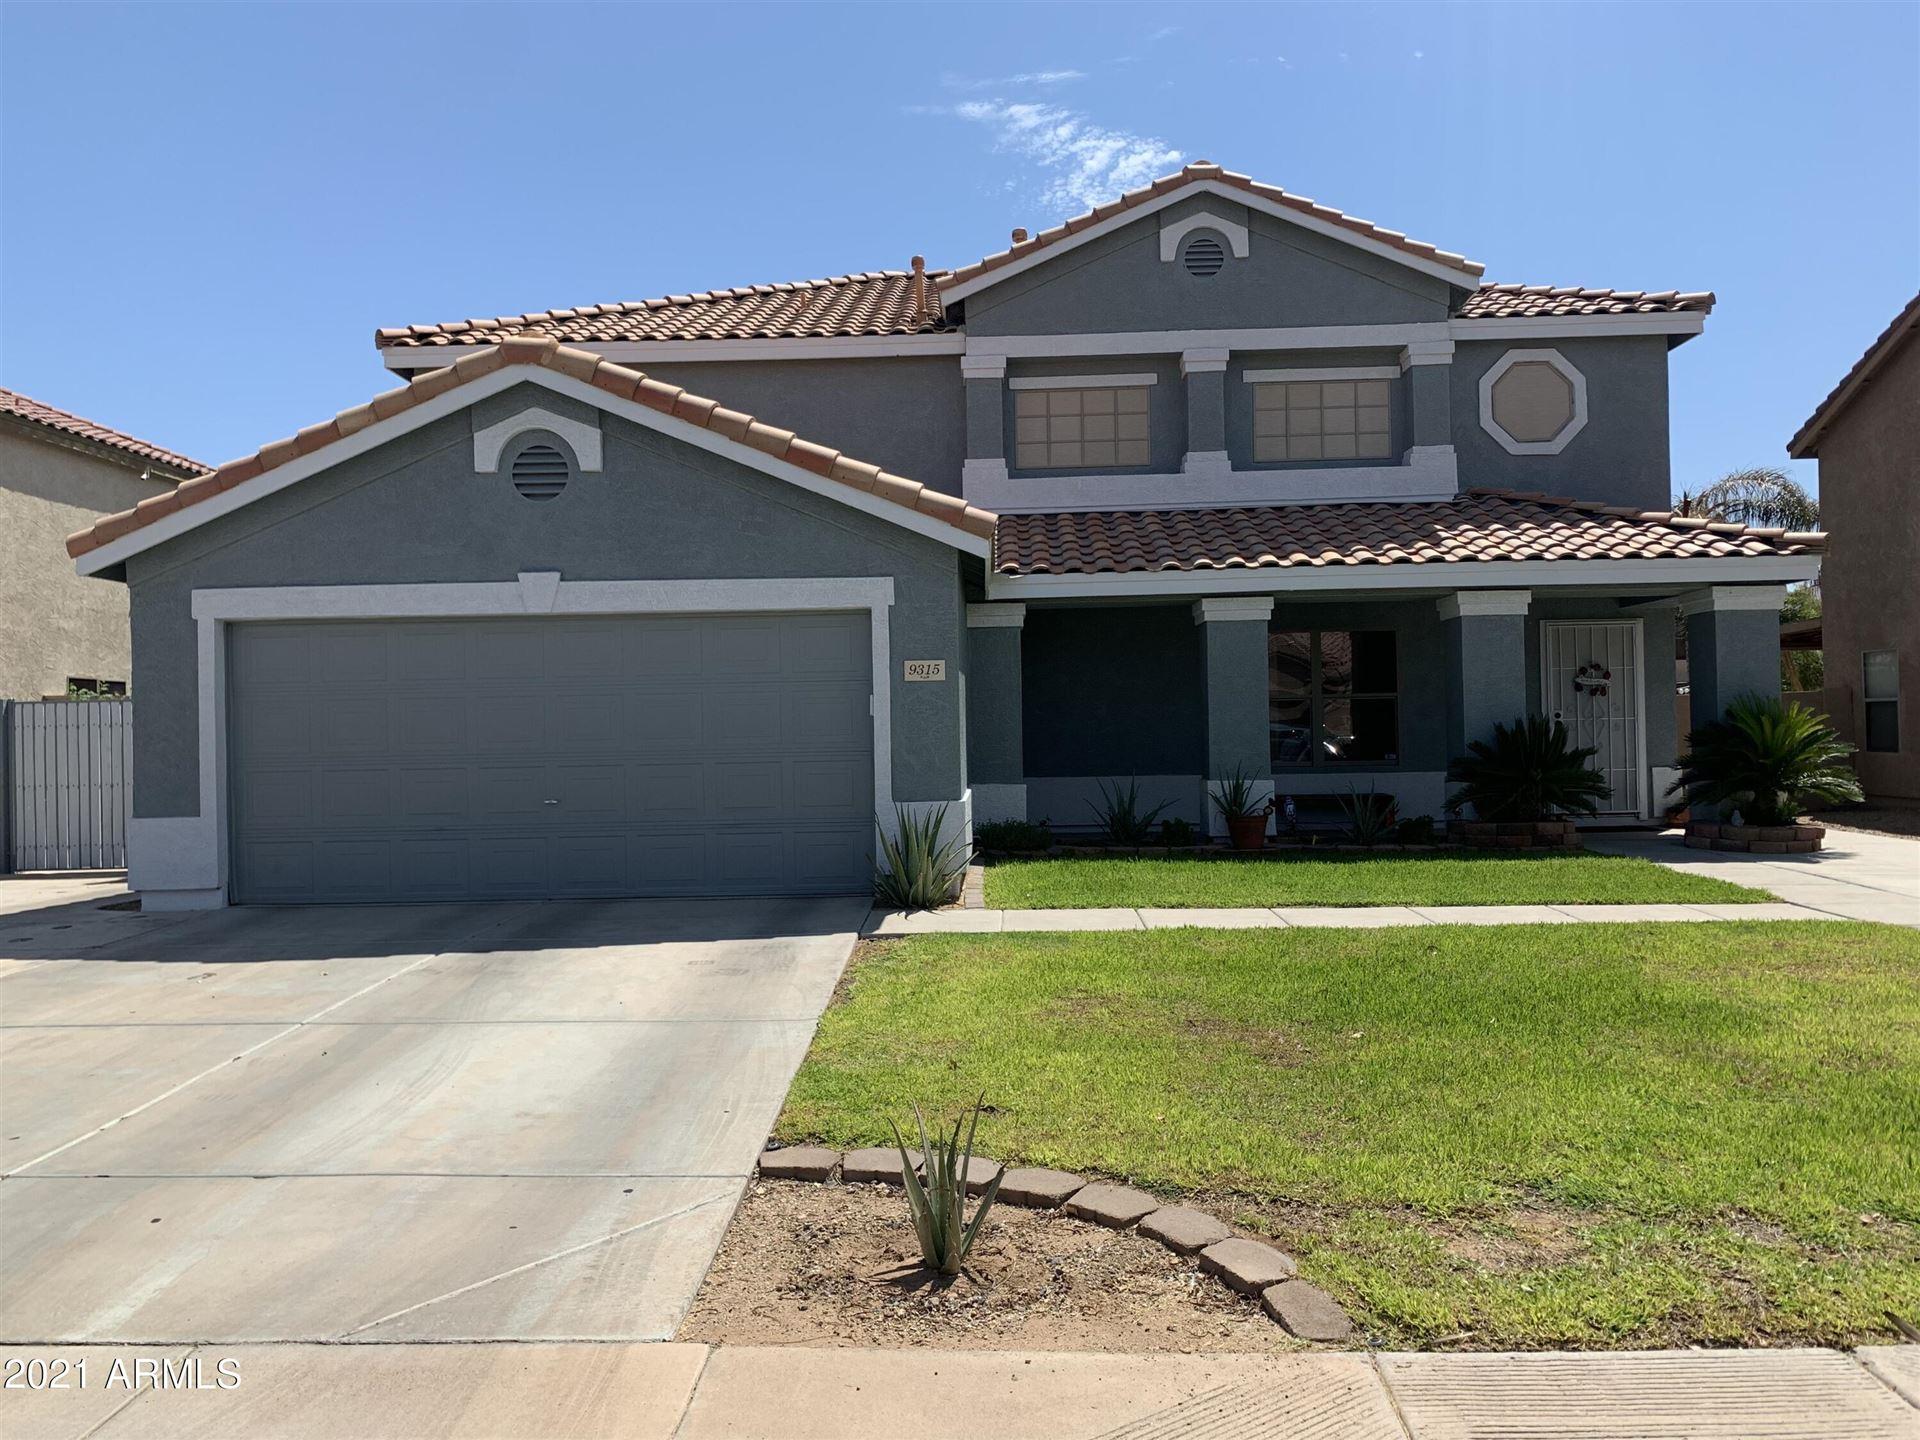 9315 W COOLIDGE Street, Phoenix, AZ 85037 - MLS#: 6288668